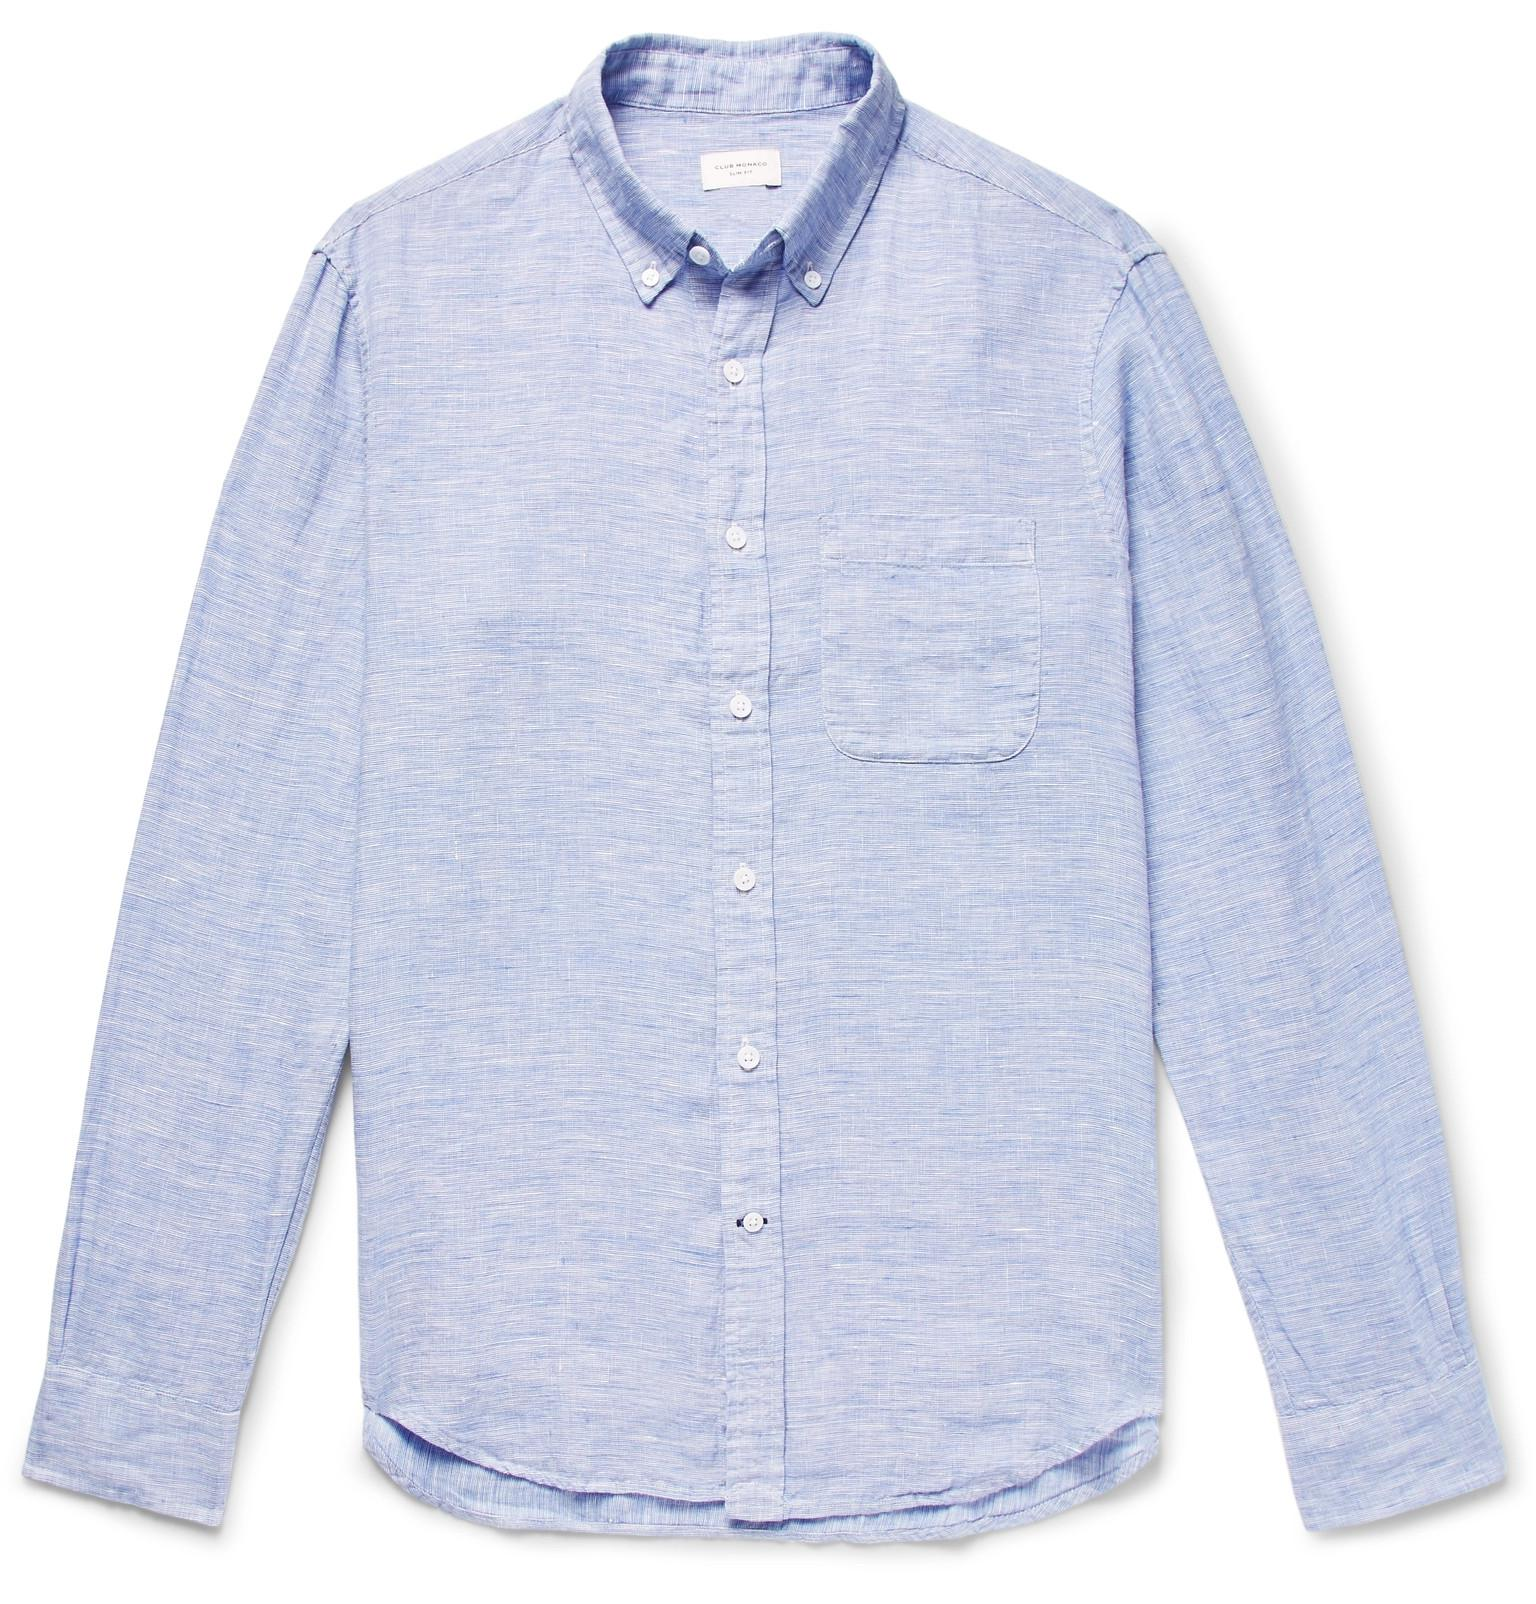 CLUB MONACO Button-down Collar Puppytooth Slub Linen Shirt - Pink IquXYK